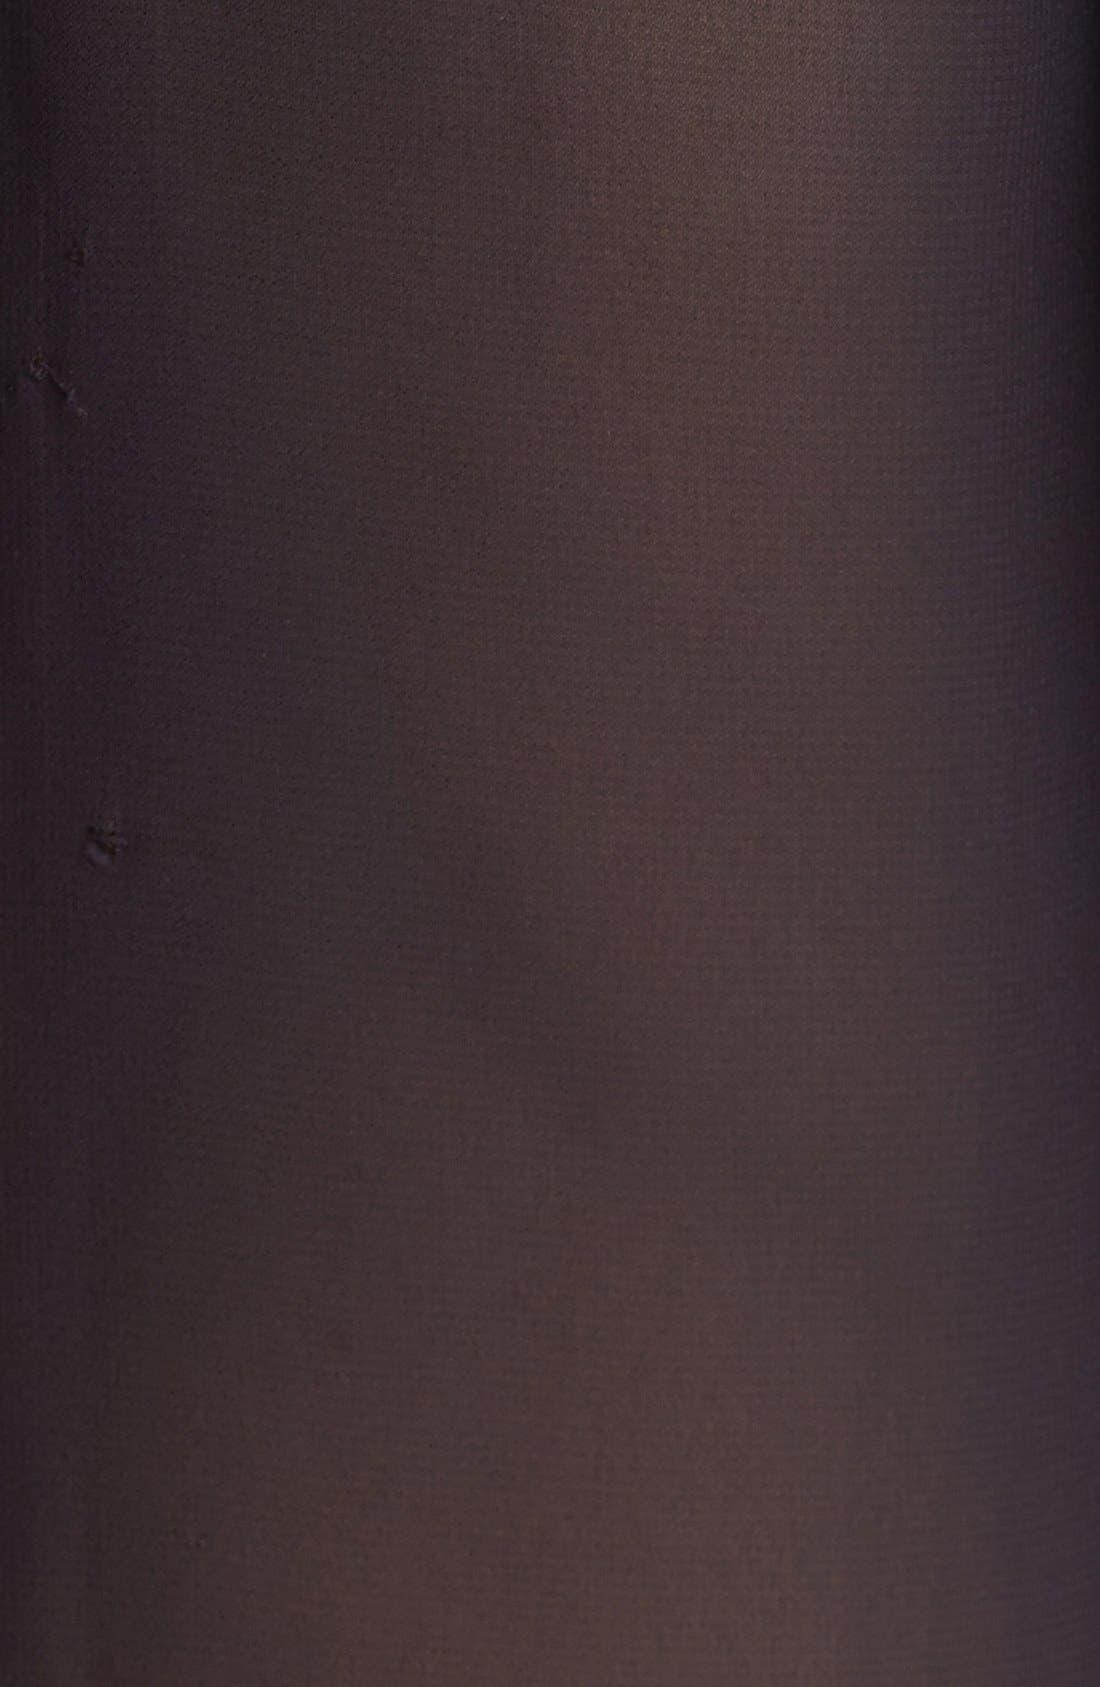 Alternate Image 3  - Vince Camuto Chiffon Sleeve Mixed Media Tee